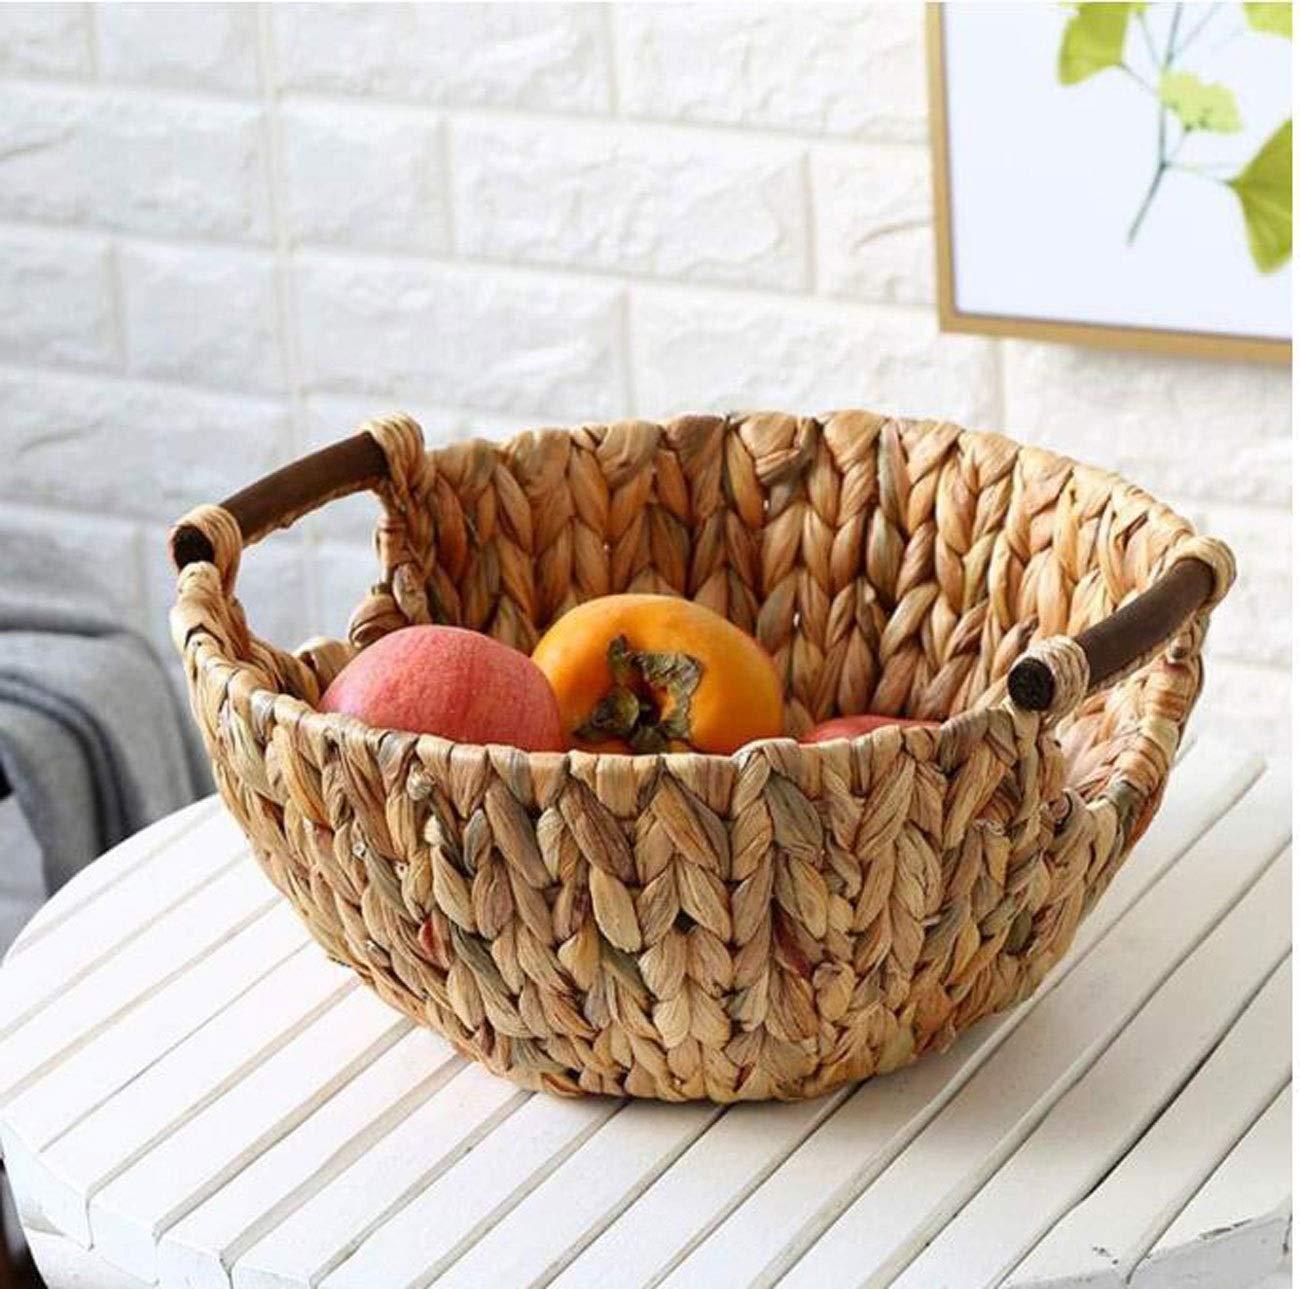 HYZSGP Fruit plate Fruit Storage Basket Storage Basket Handmade Vegetable Basket Retro Multi-function Large-capacity Storage Basket fruit basket snack plate Fruit Bowl Fruit Basket